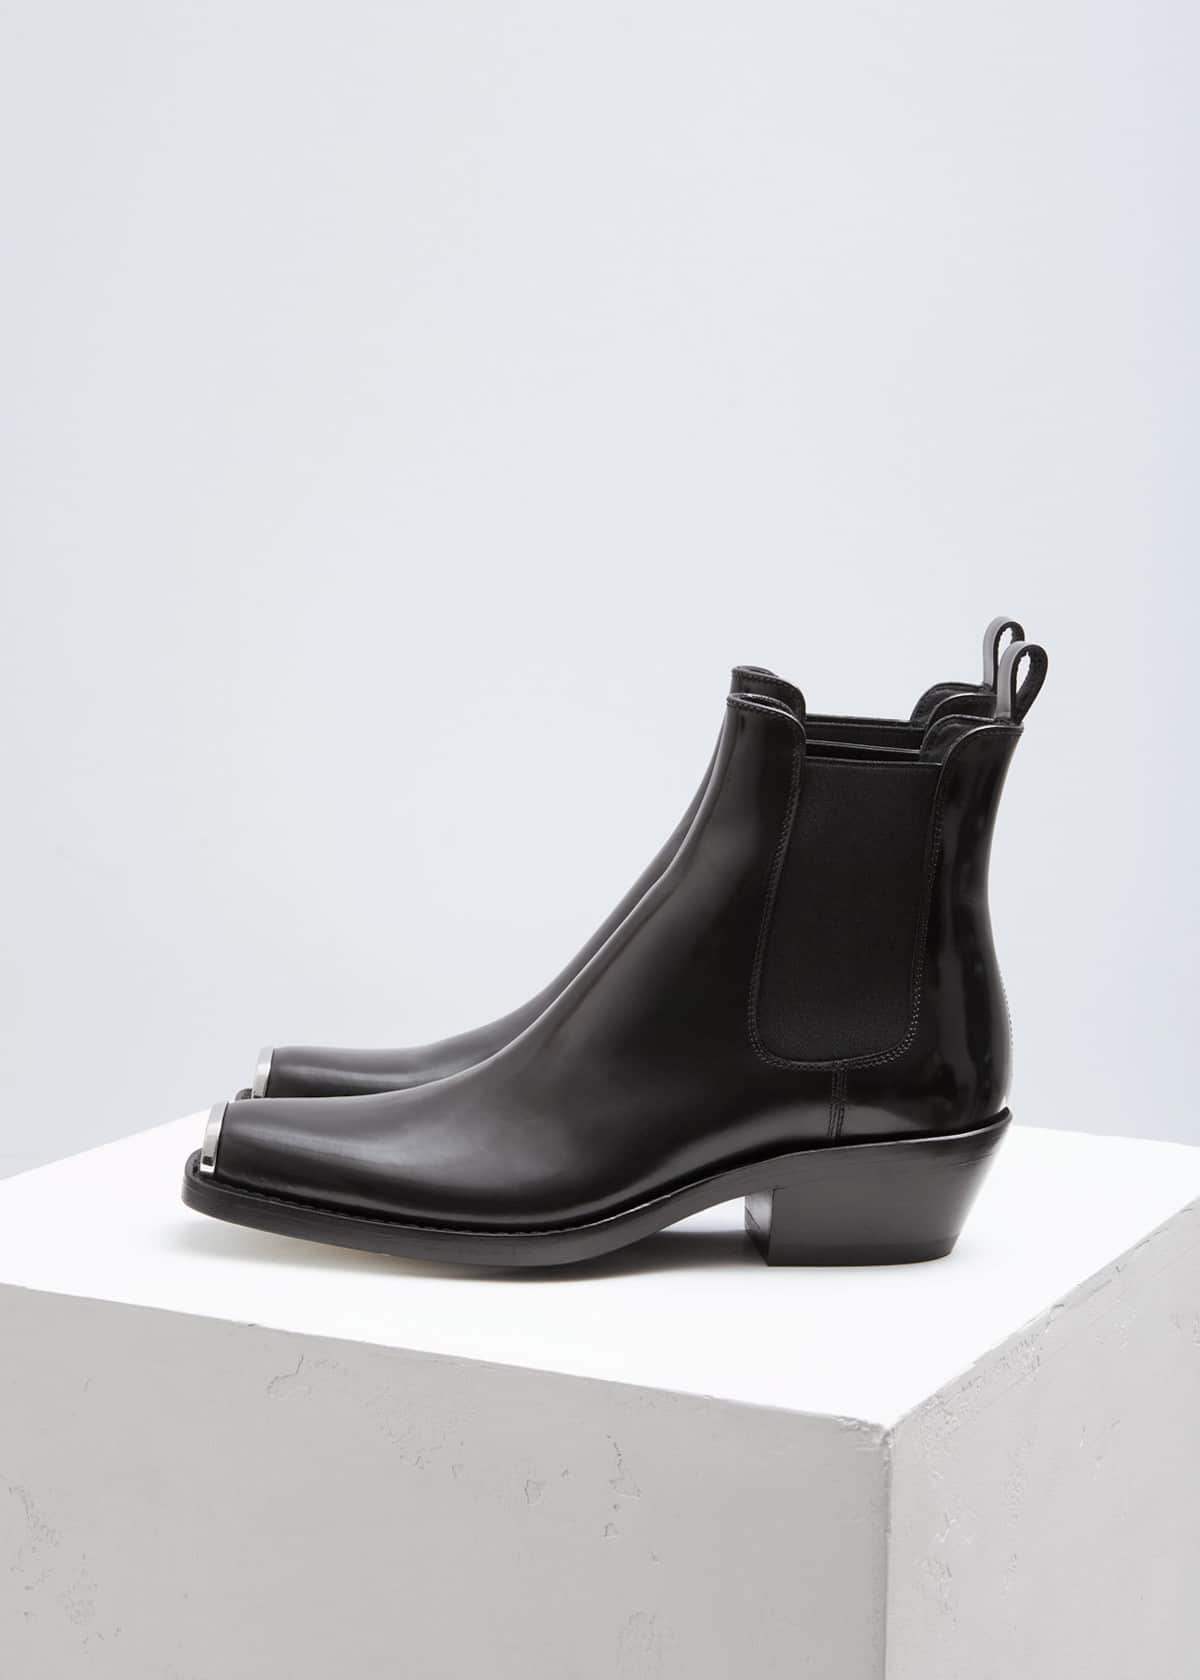 Latest shoes for girls 2018-2019 Tuko.co.ke